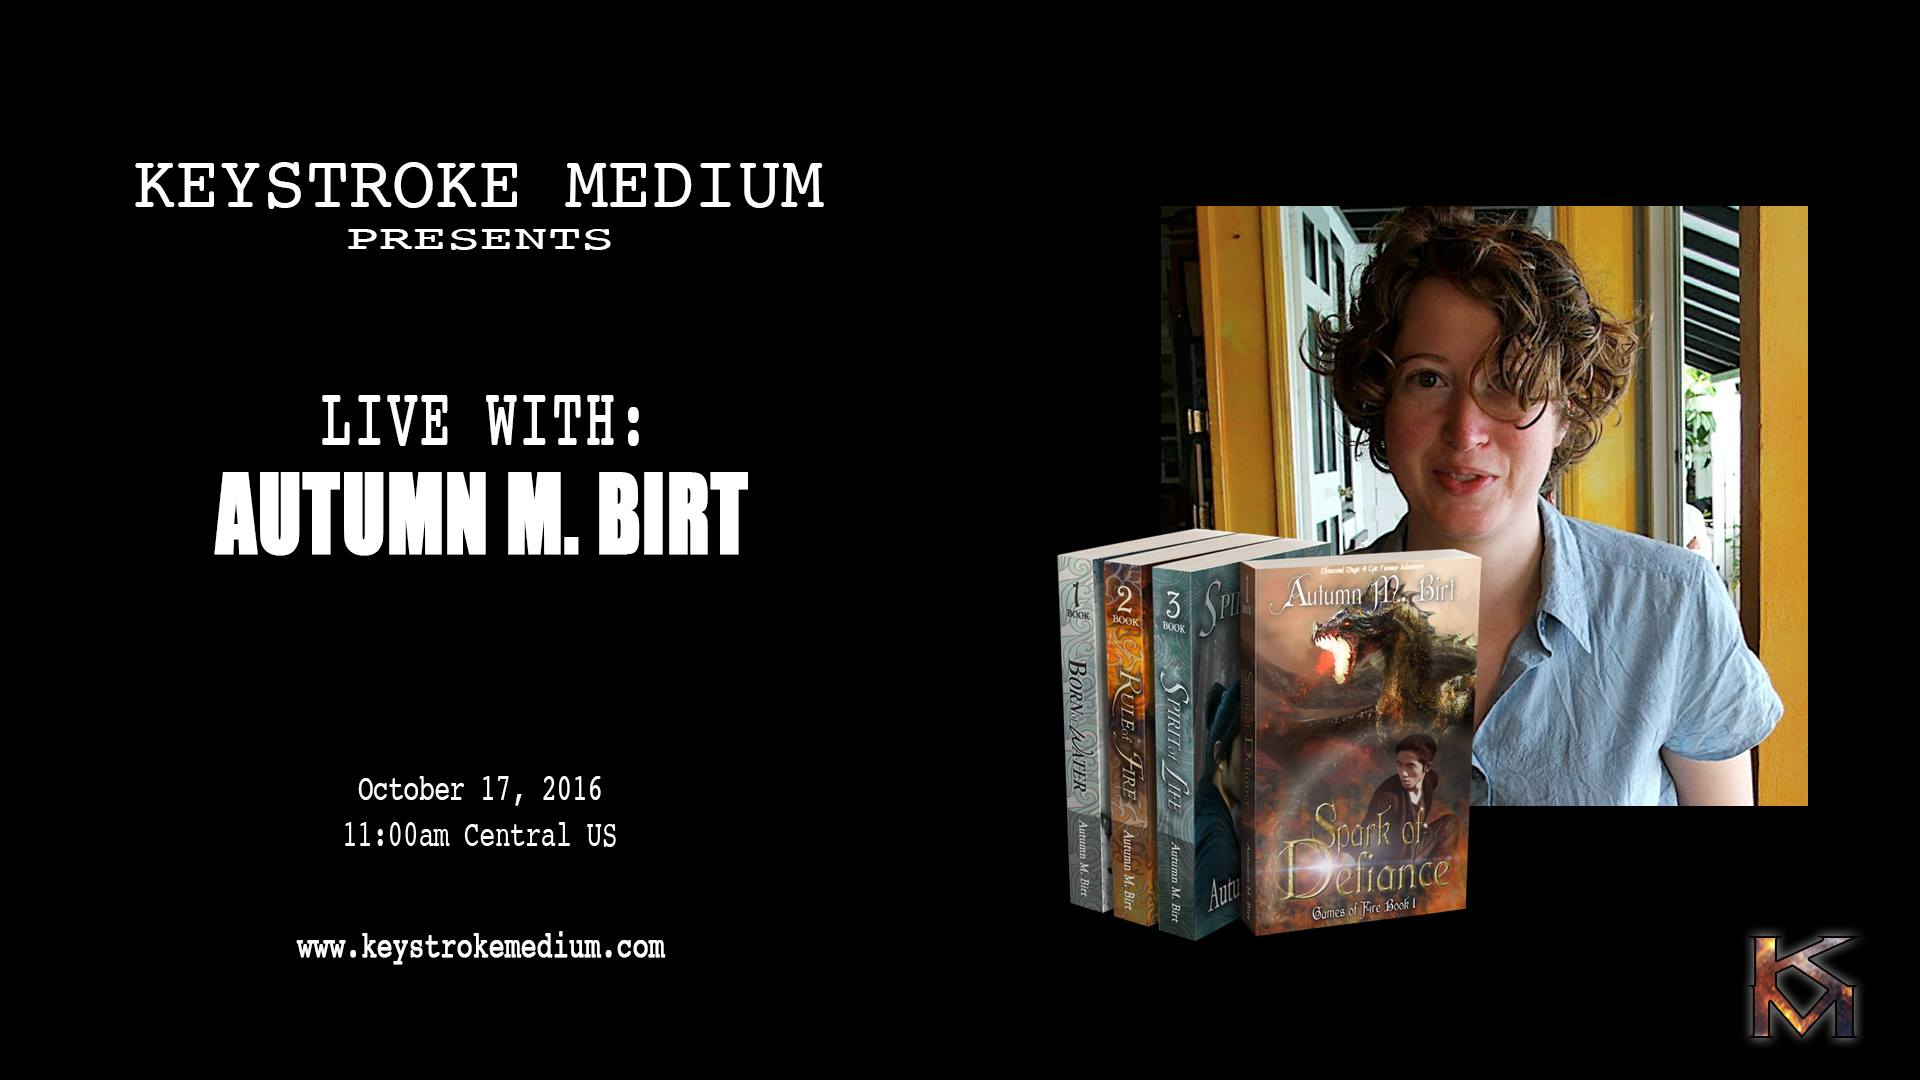 Live! with Autumn Birt and Keystroke Medium